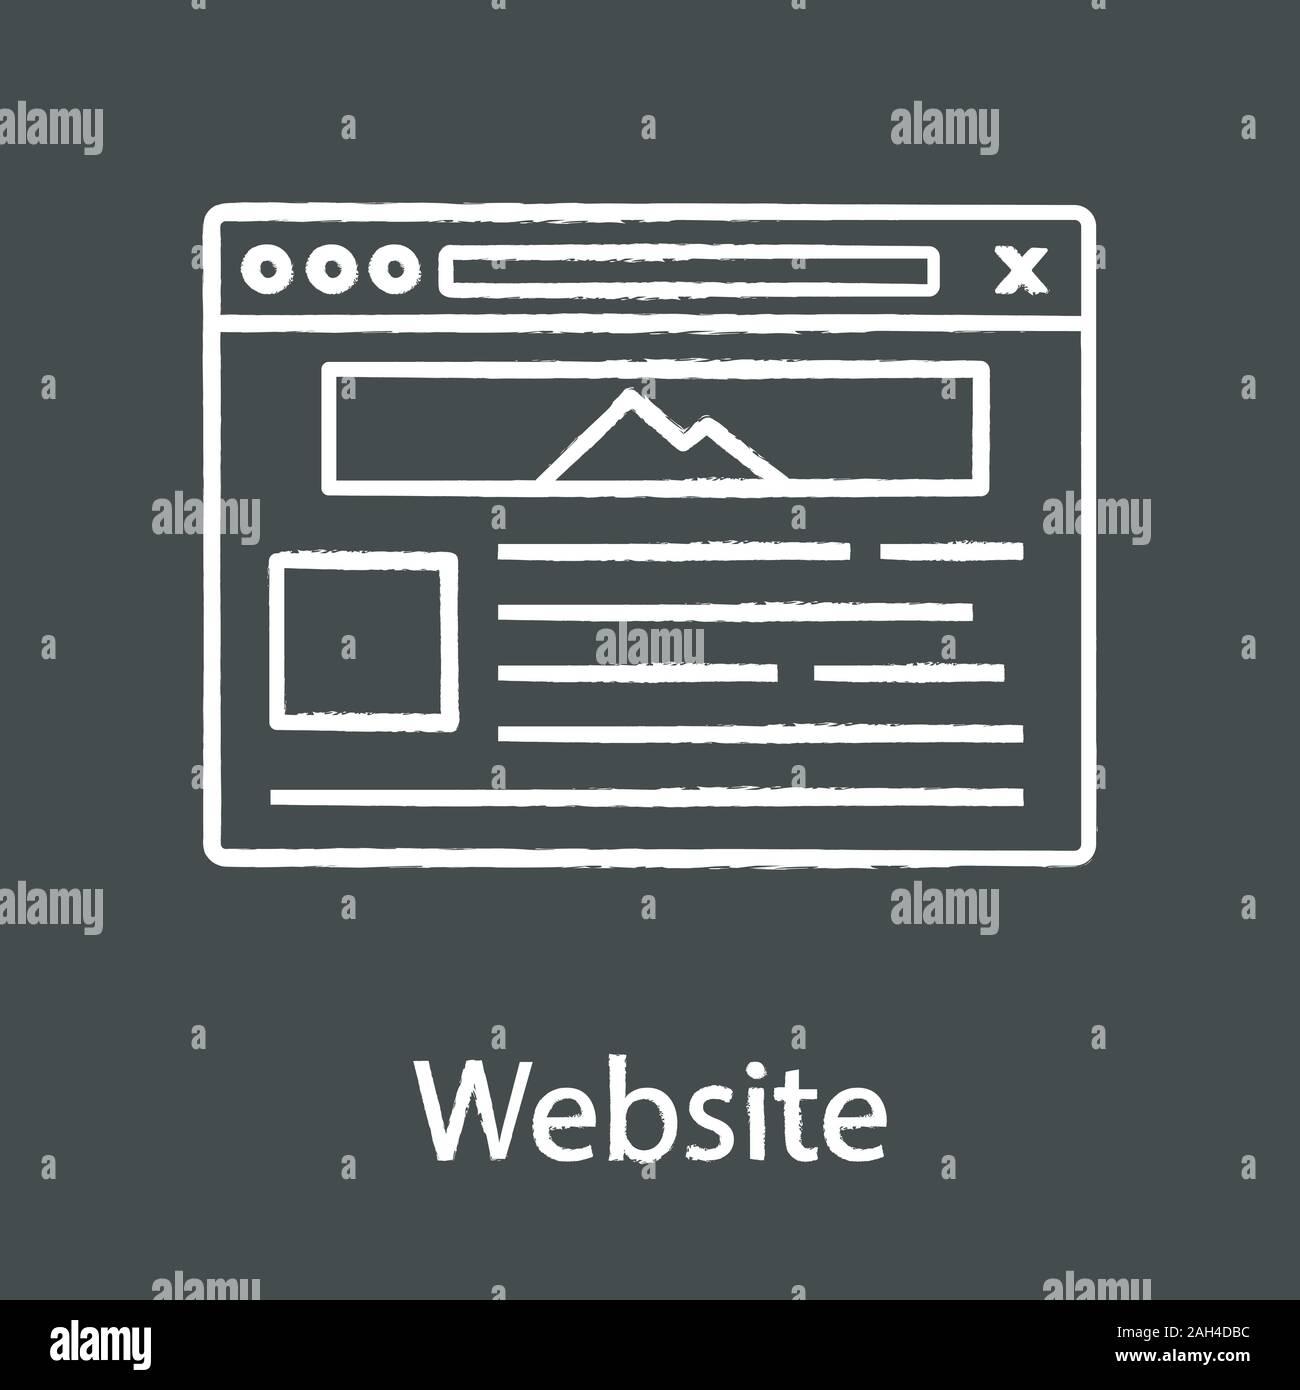 Website Chalk Icon Web Page Web Browser Interface Internet Marketing Social Media Internet Shop Webpage Template Website Design Service Isolate Stock Vector Image Art Alamy